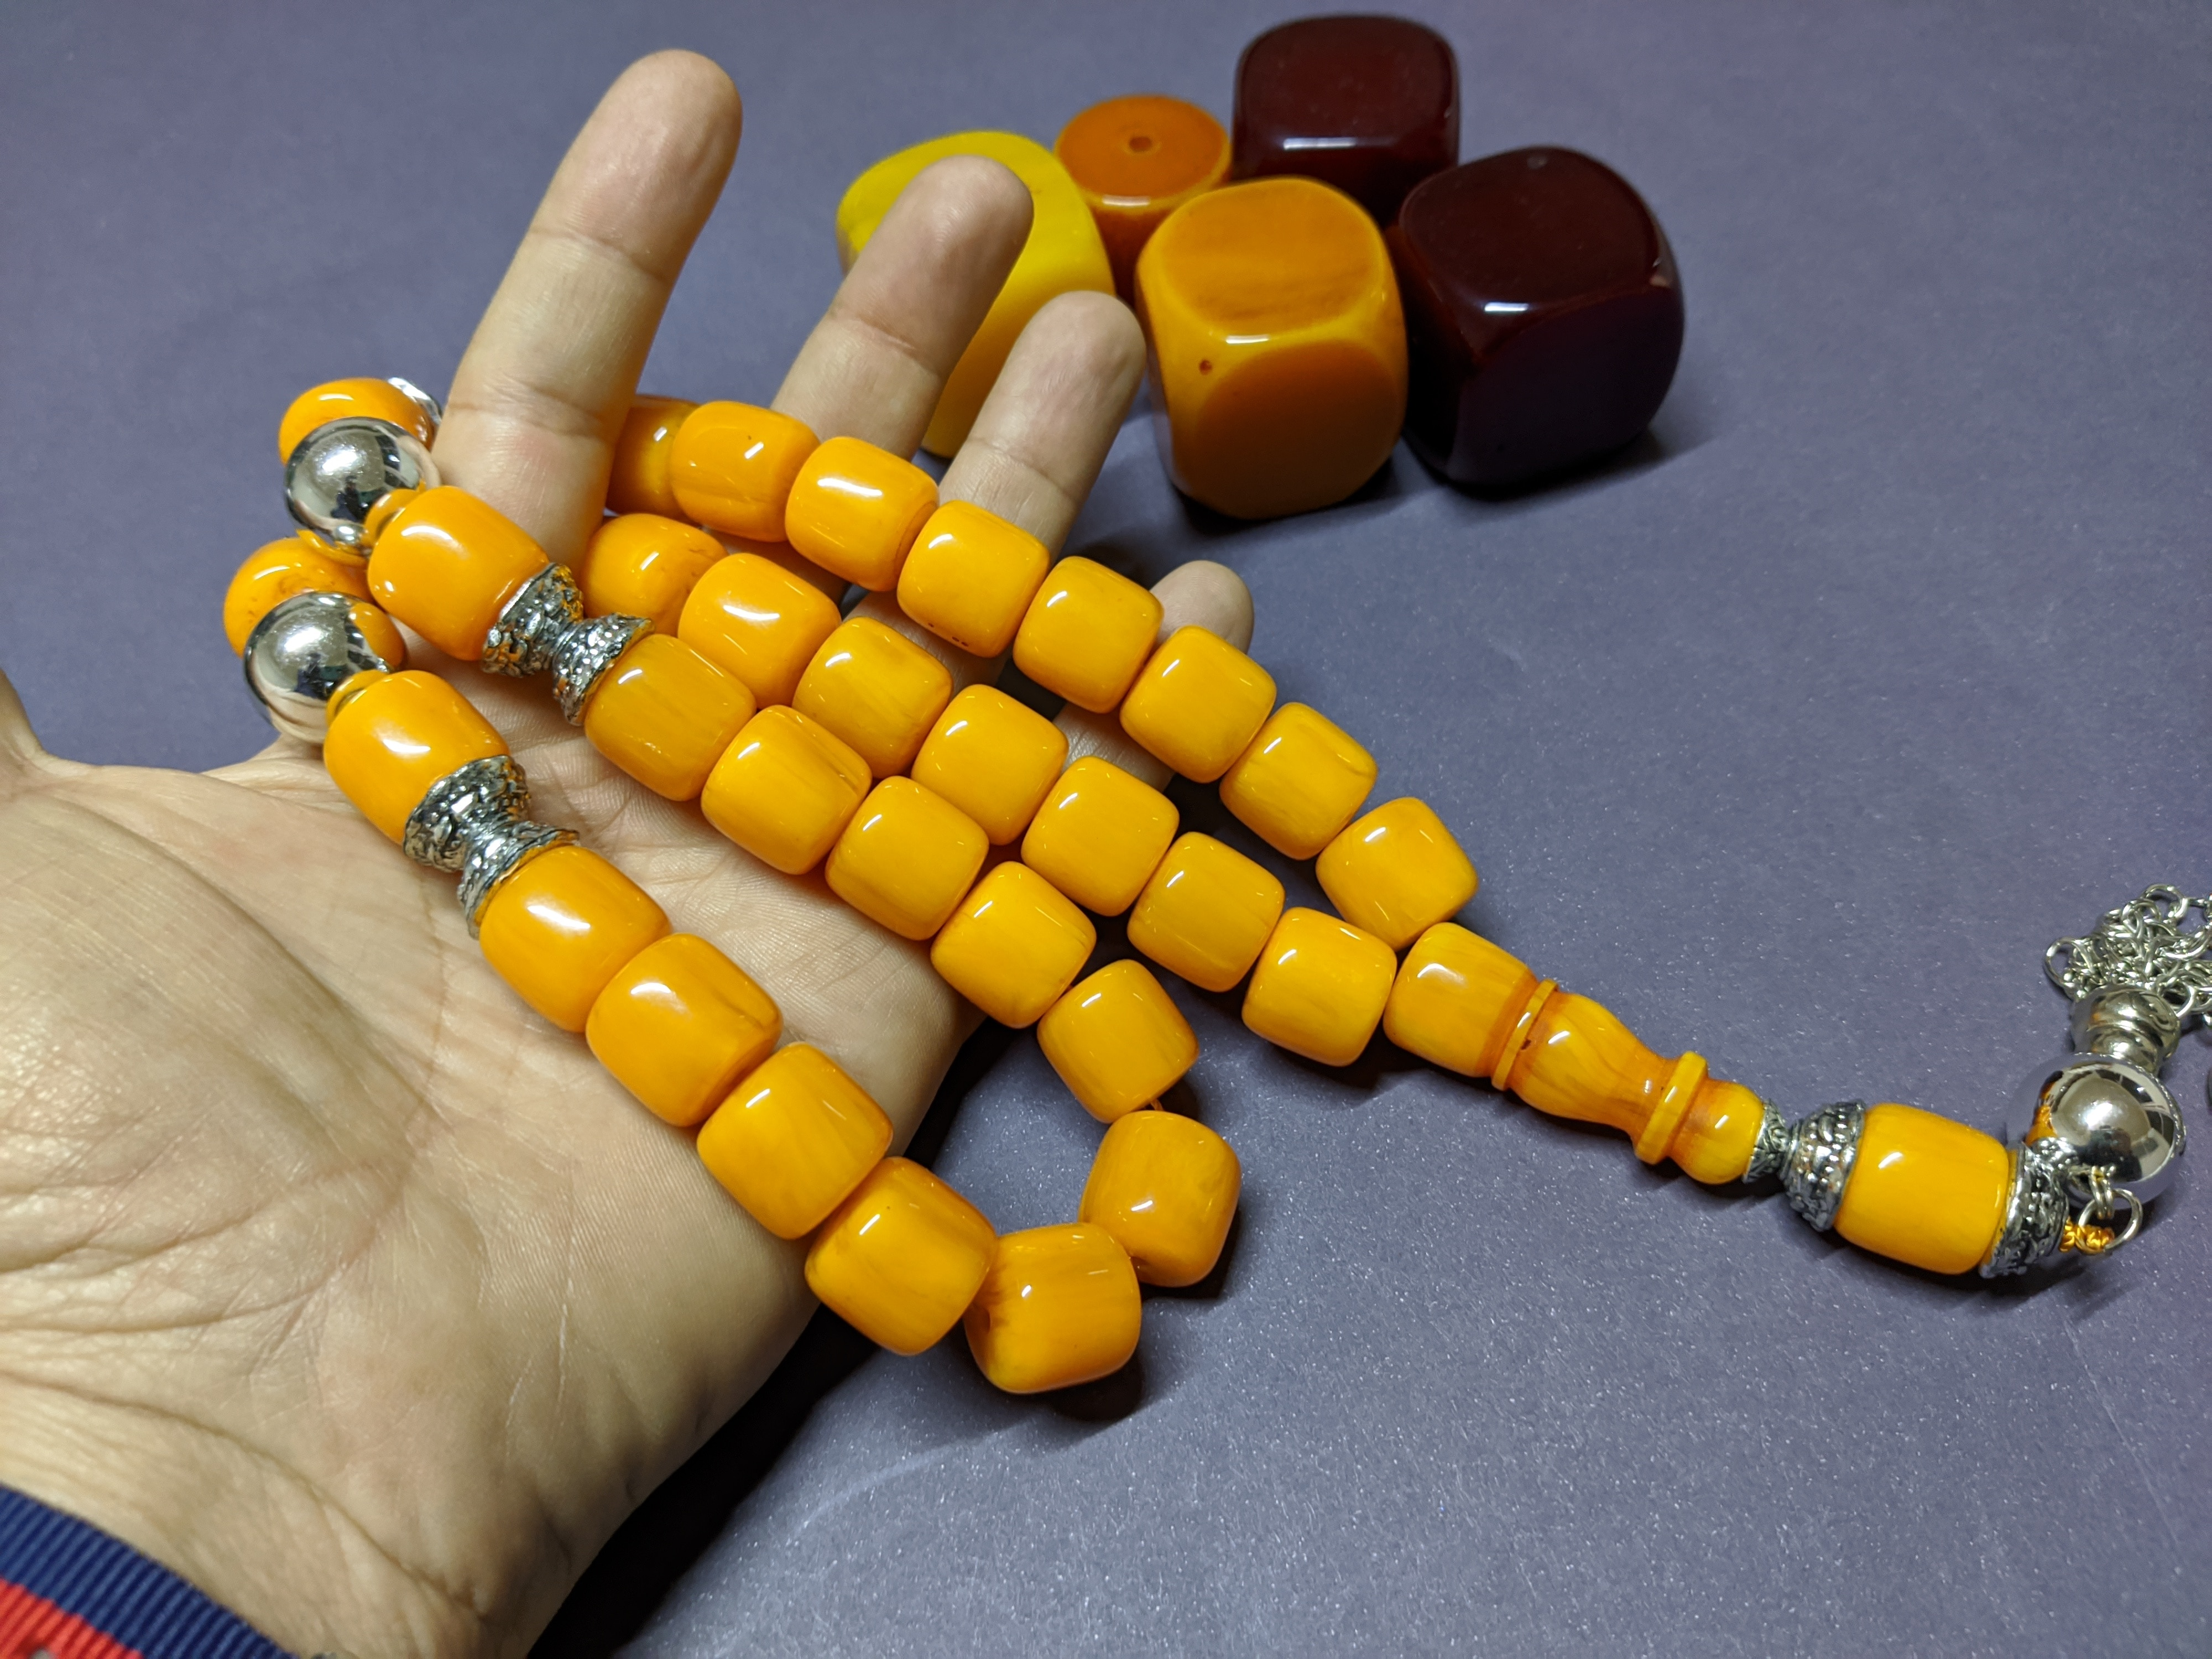 Ottoman Faturan German Amber Sandalous Misbaha Prayer Beads Islamic Gift Tasbih Tasbeeh Tasbeh Rosary Tasbih # 25A